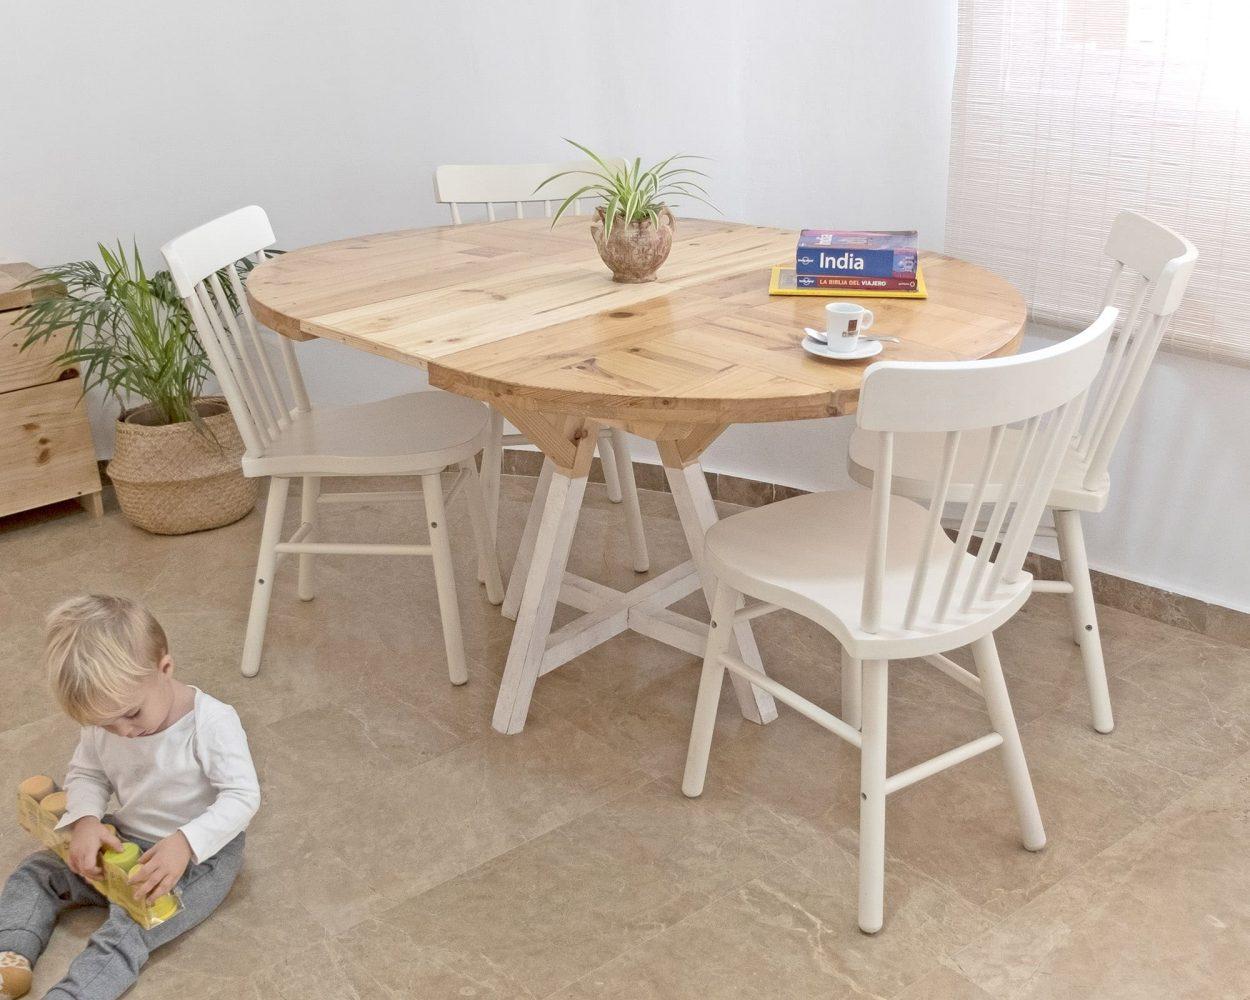 Mesa redonda de madera extensible hecha a mano en valencia. Materiales reciclados. A medida